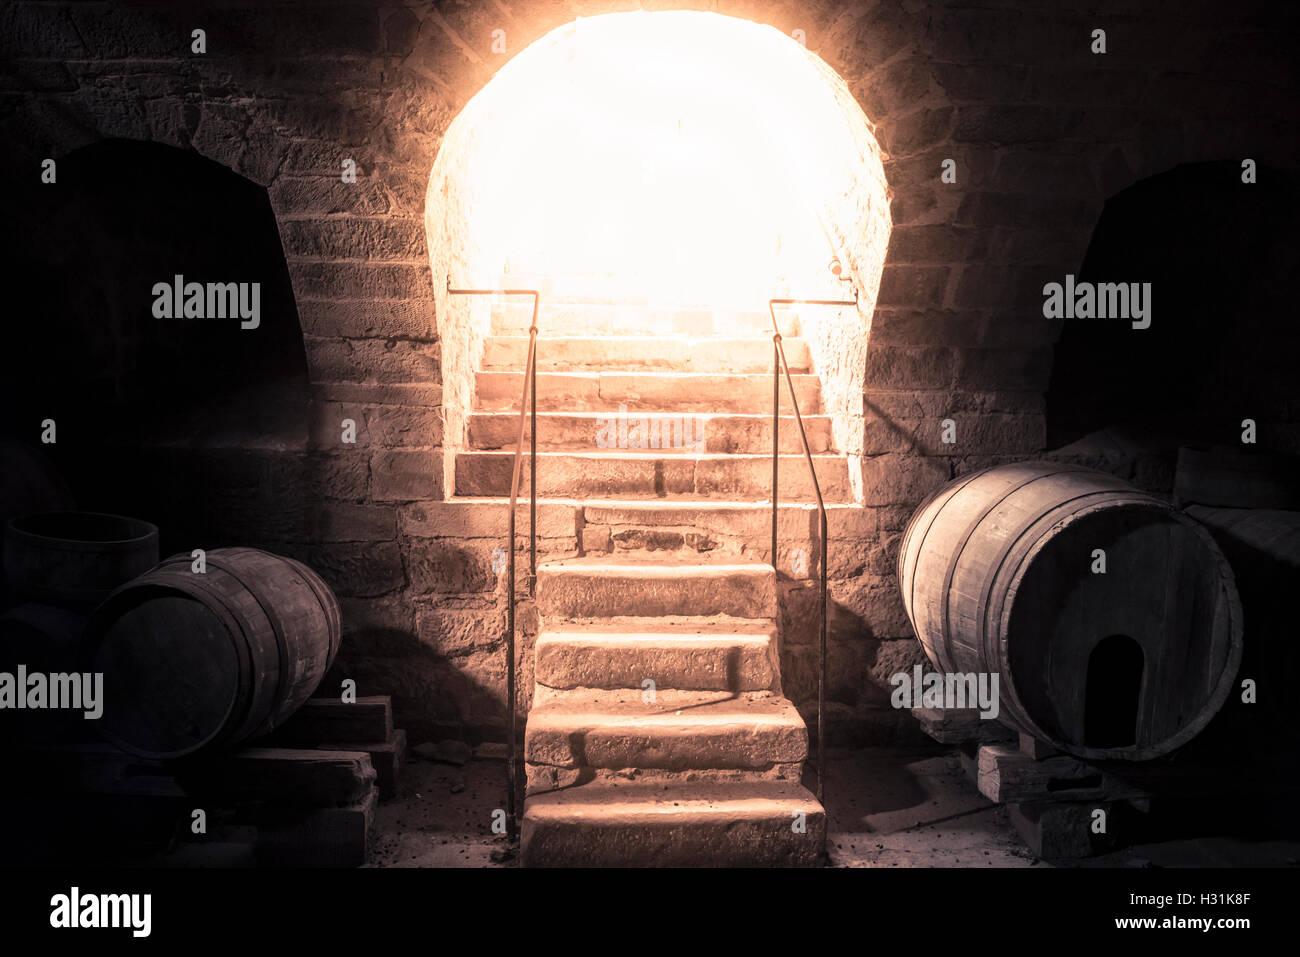 Lighting Basement Washroom Stairs: Scary Basement Stock Photos & Scary Basement Stock Images